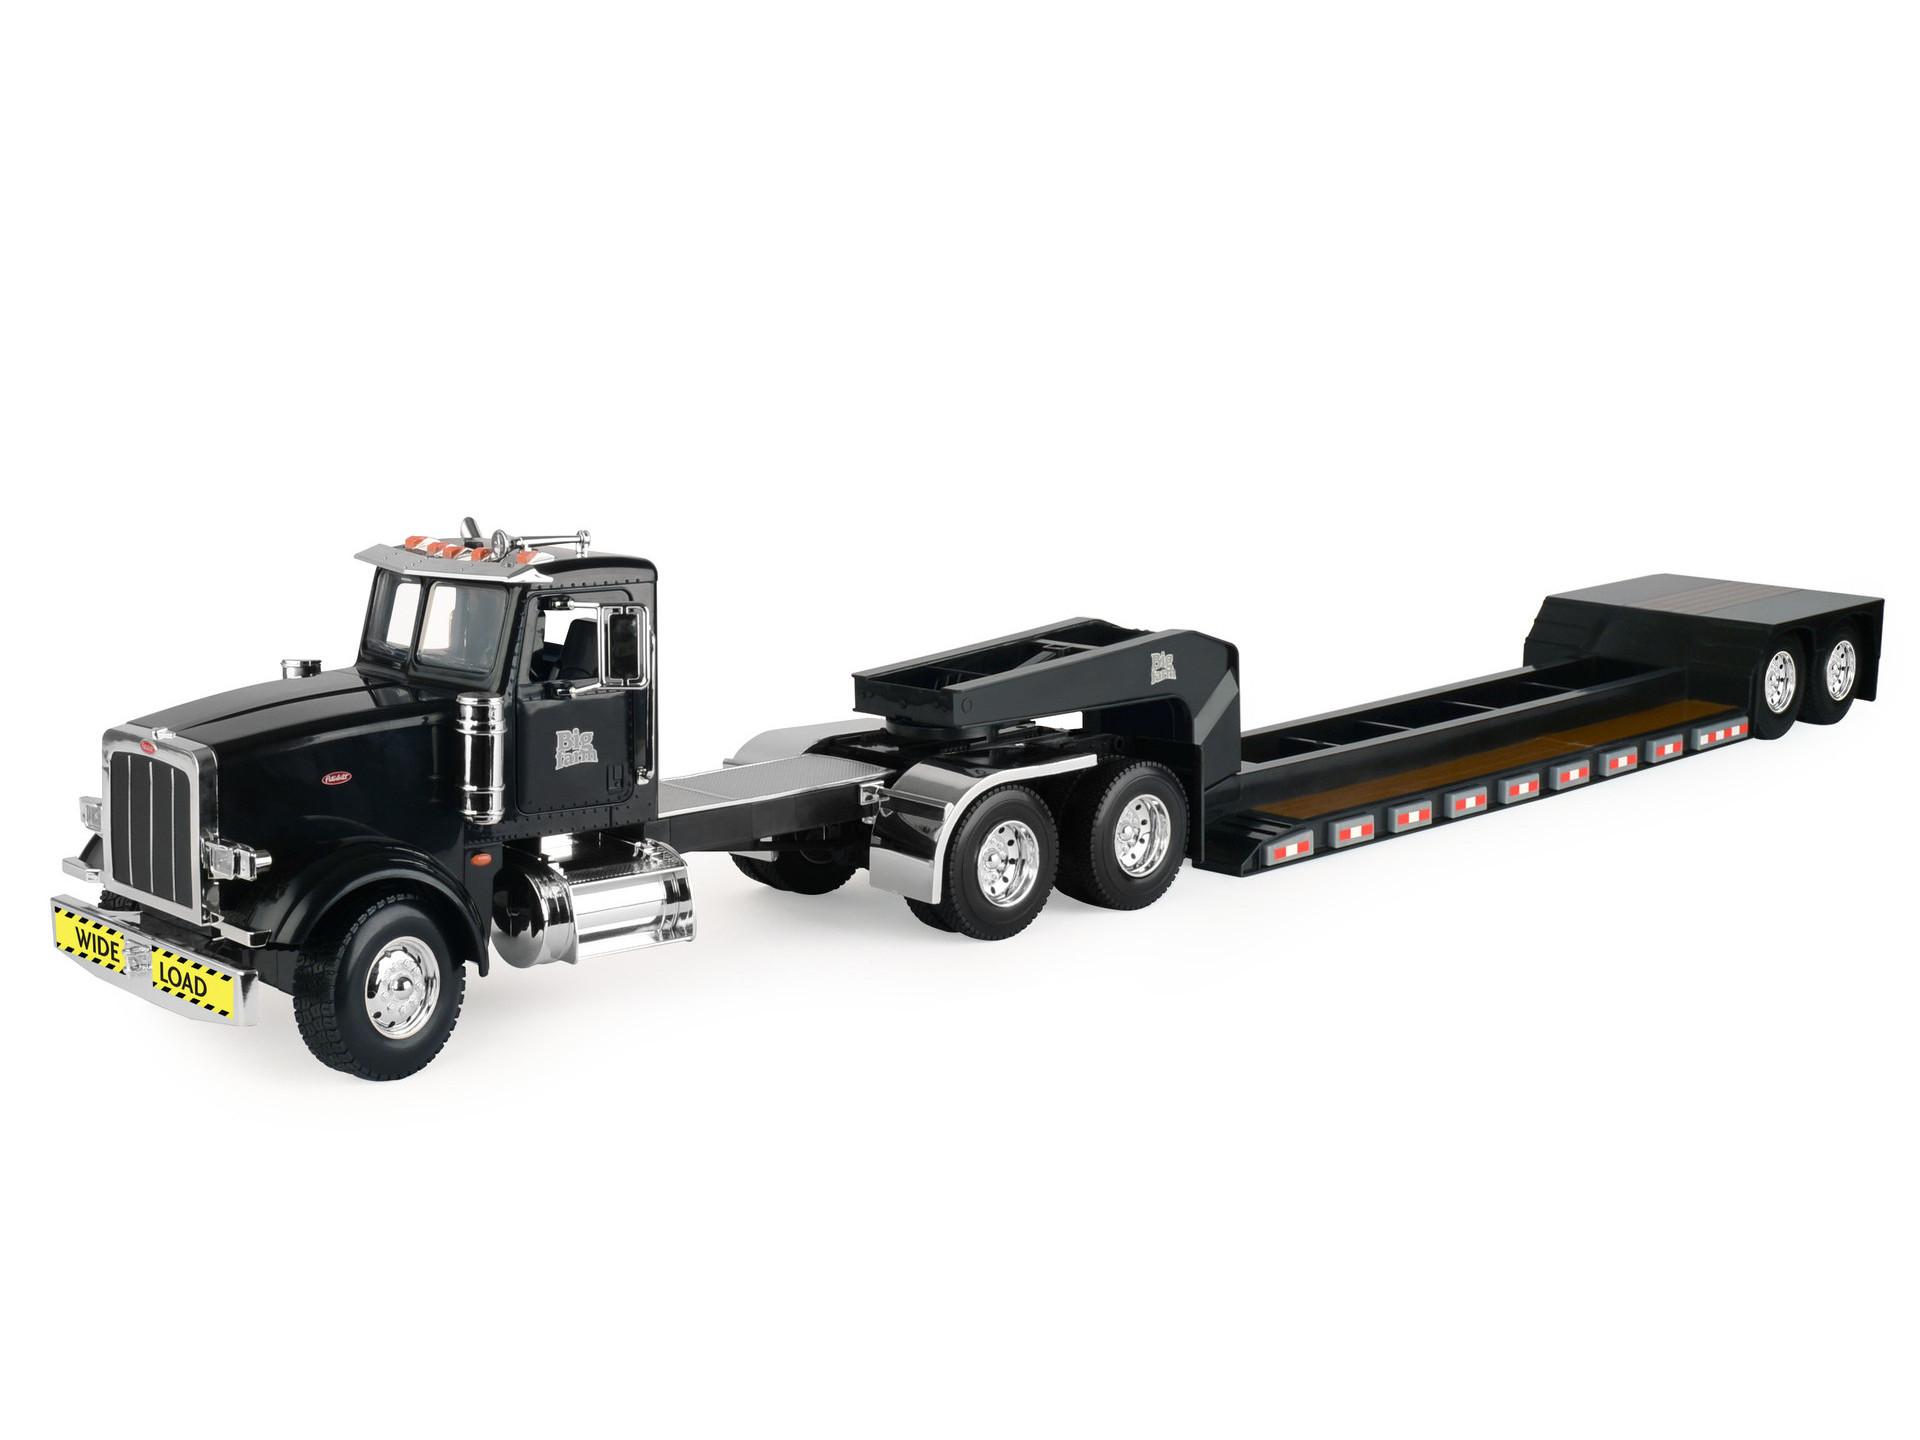 Peterbilt Truck With Lowboy Trailer